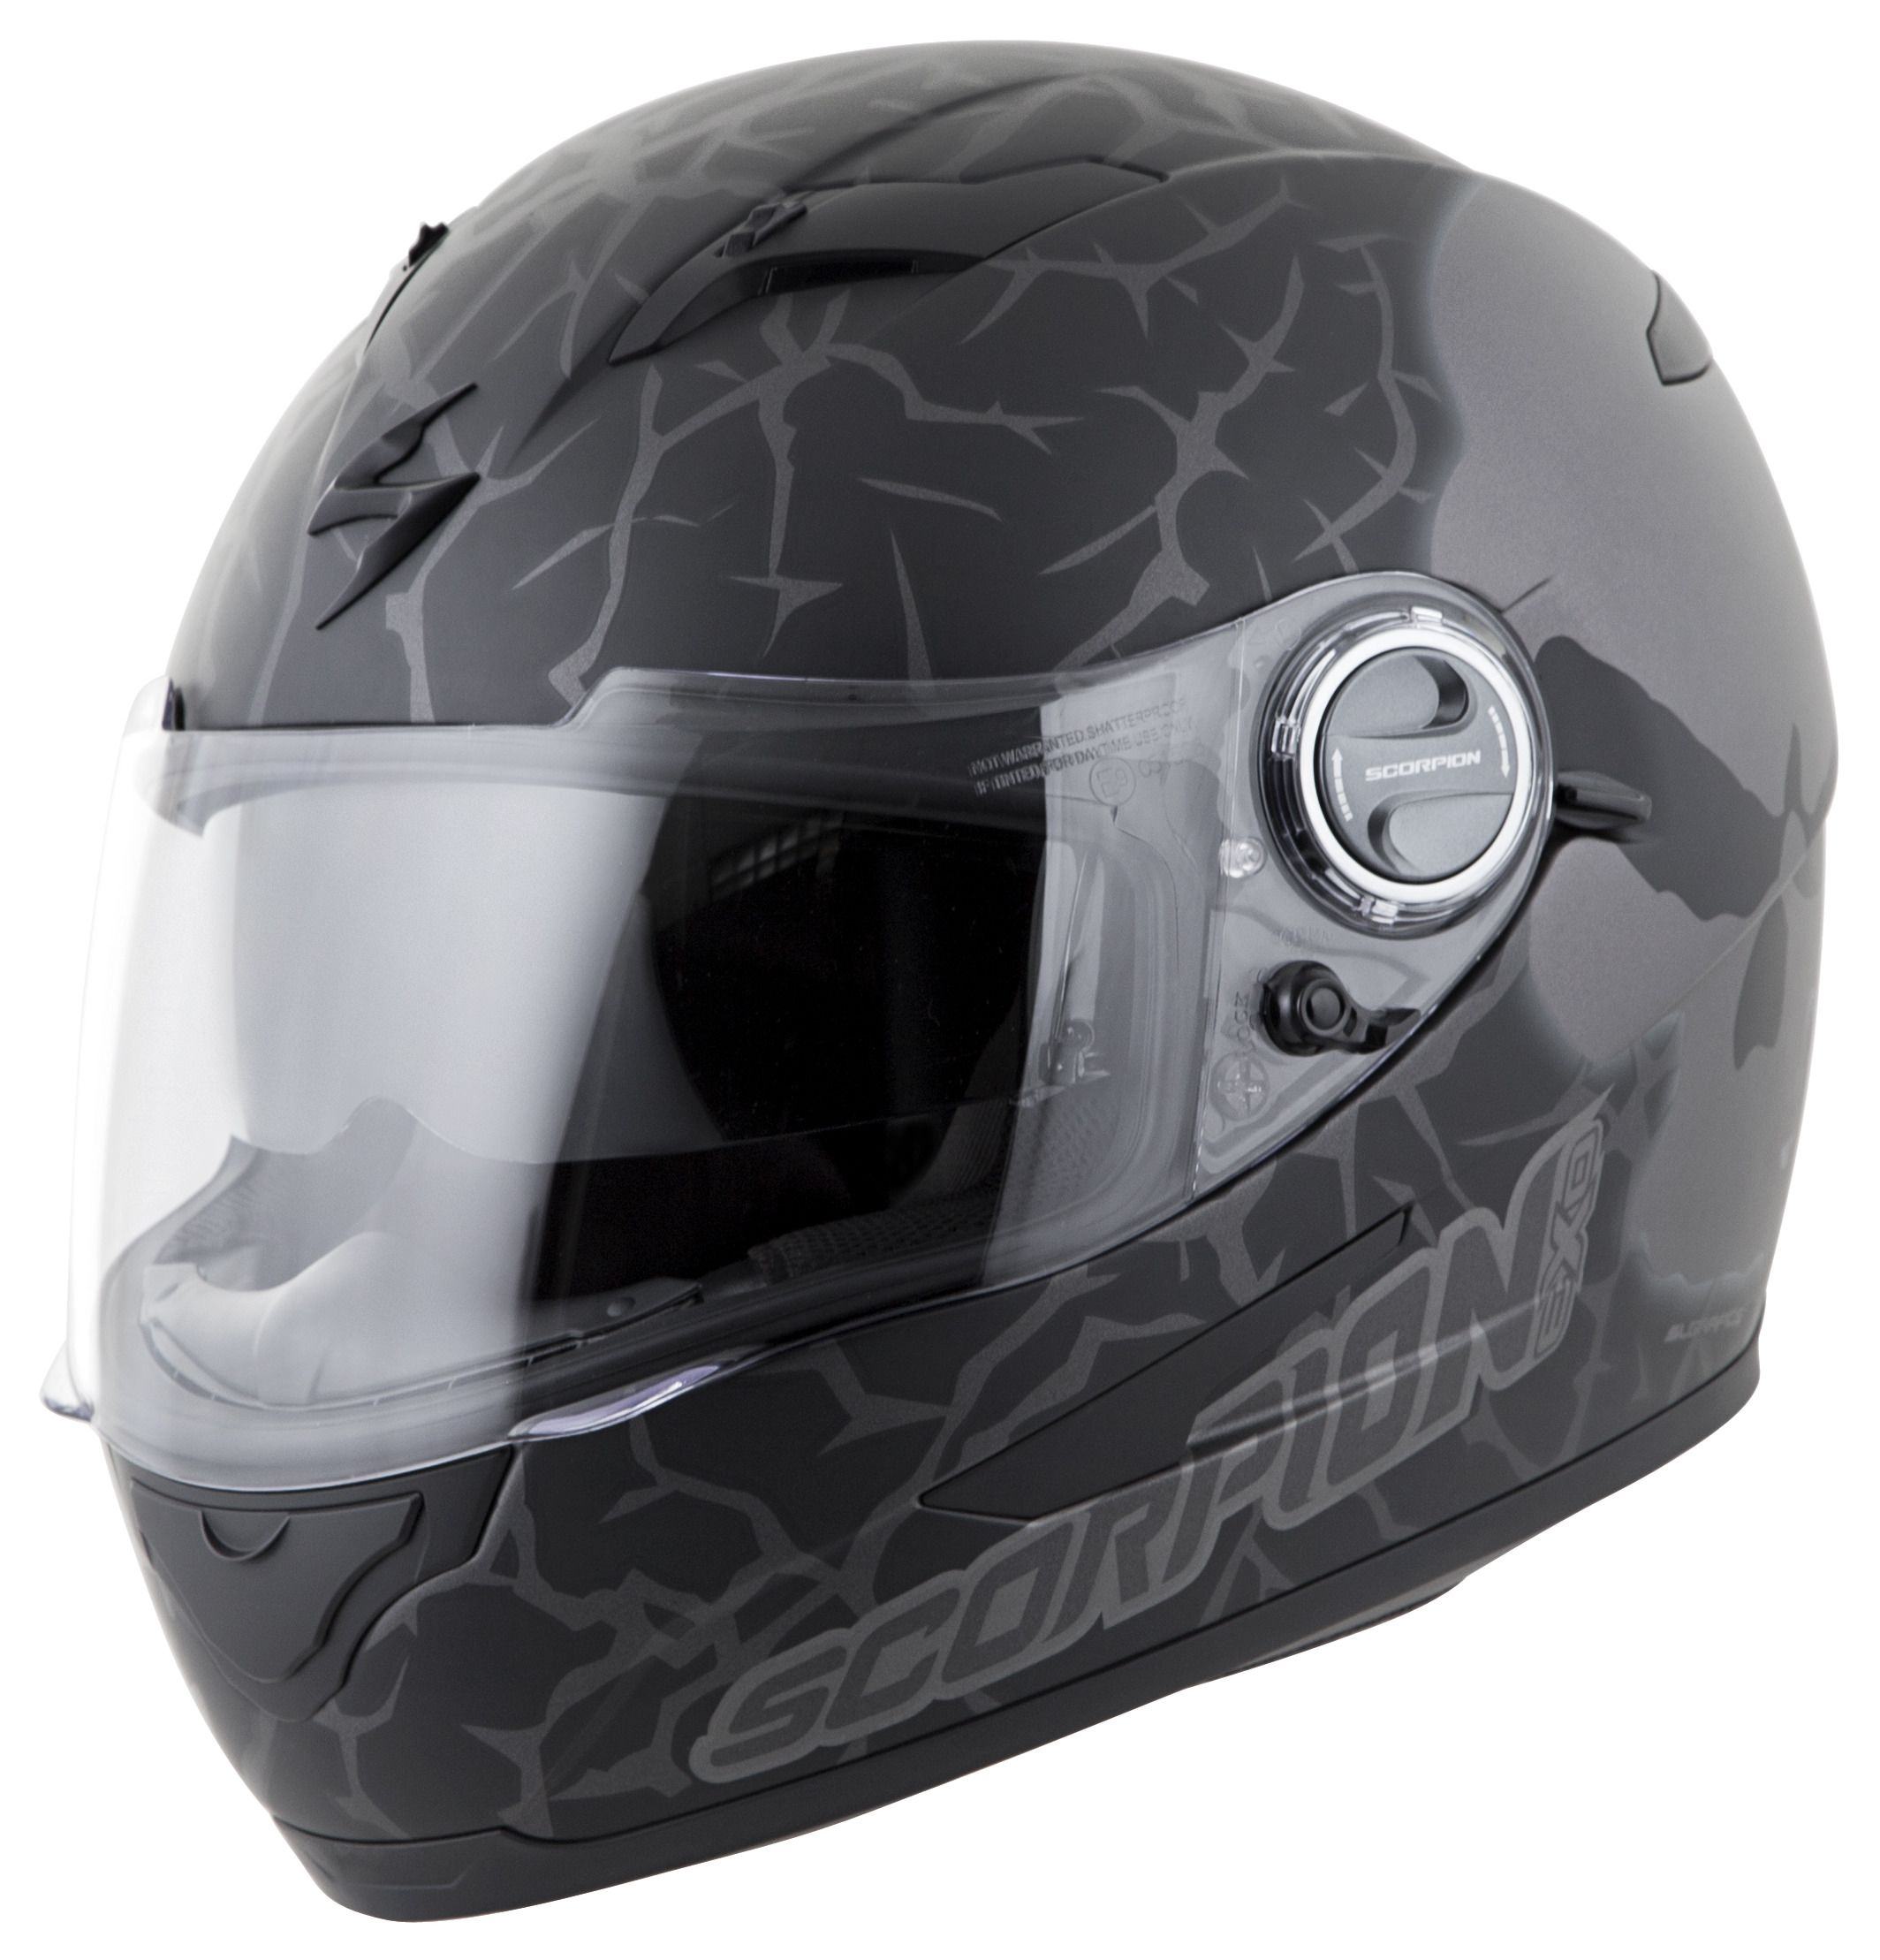 scorpion exo 500 numbskull helmet revzilla. Black Bedroom Furniture Sets. Home Design Ideas